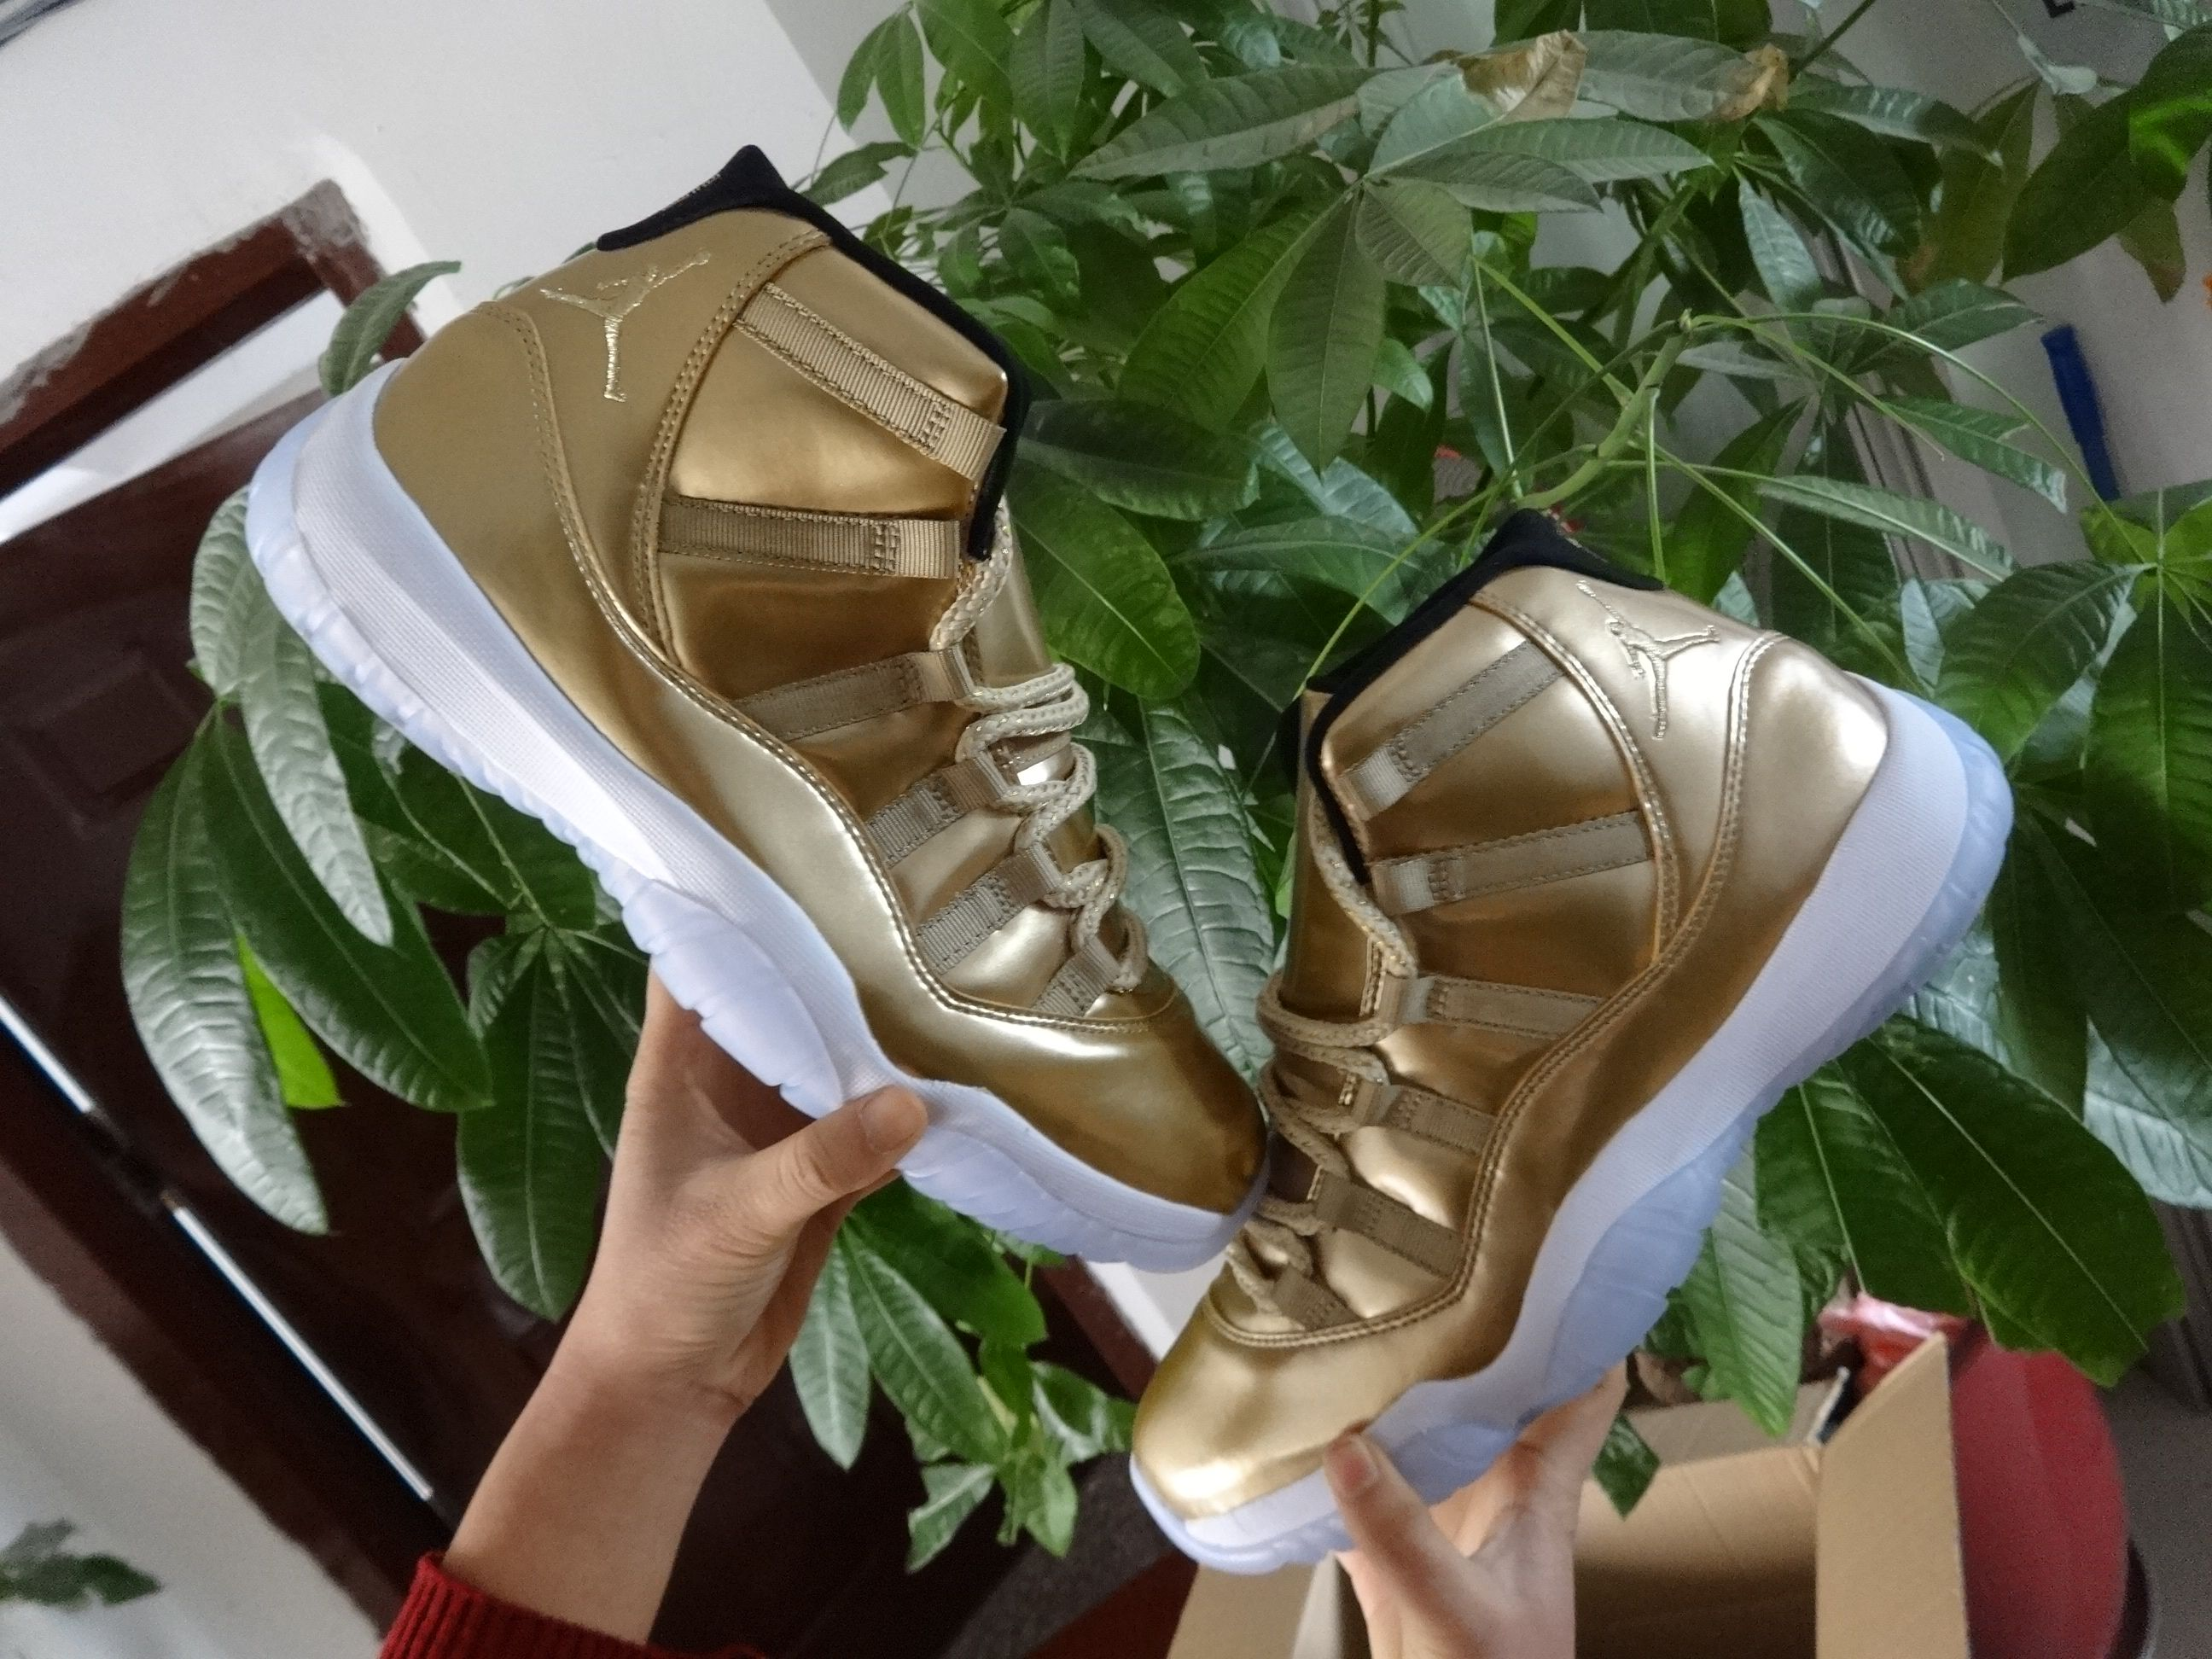 8959b4ee5636f4 jordan 11s usher gold is in stock now!!319  sneakerbook.org